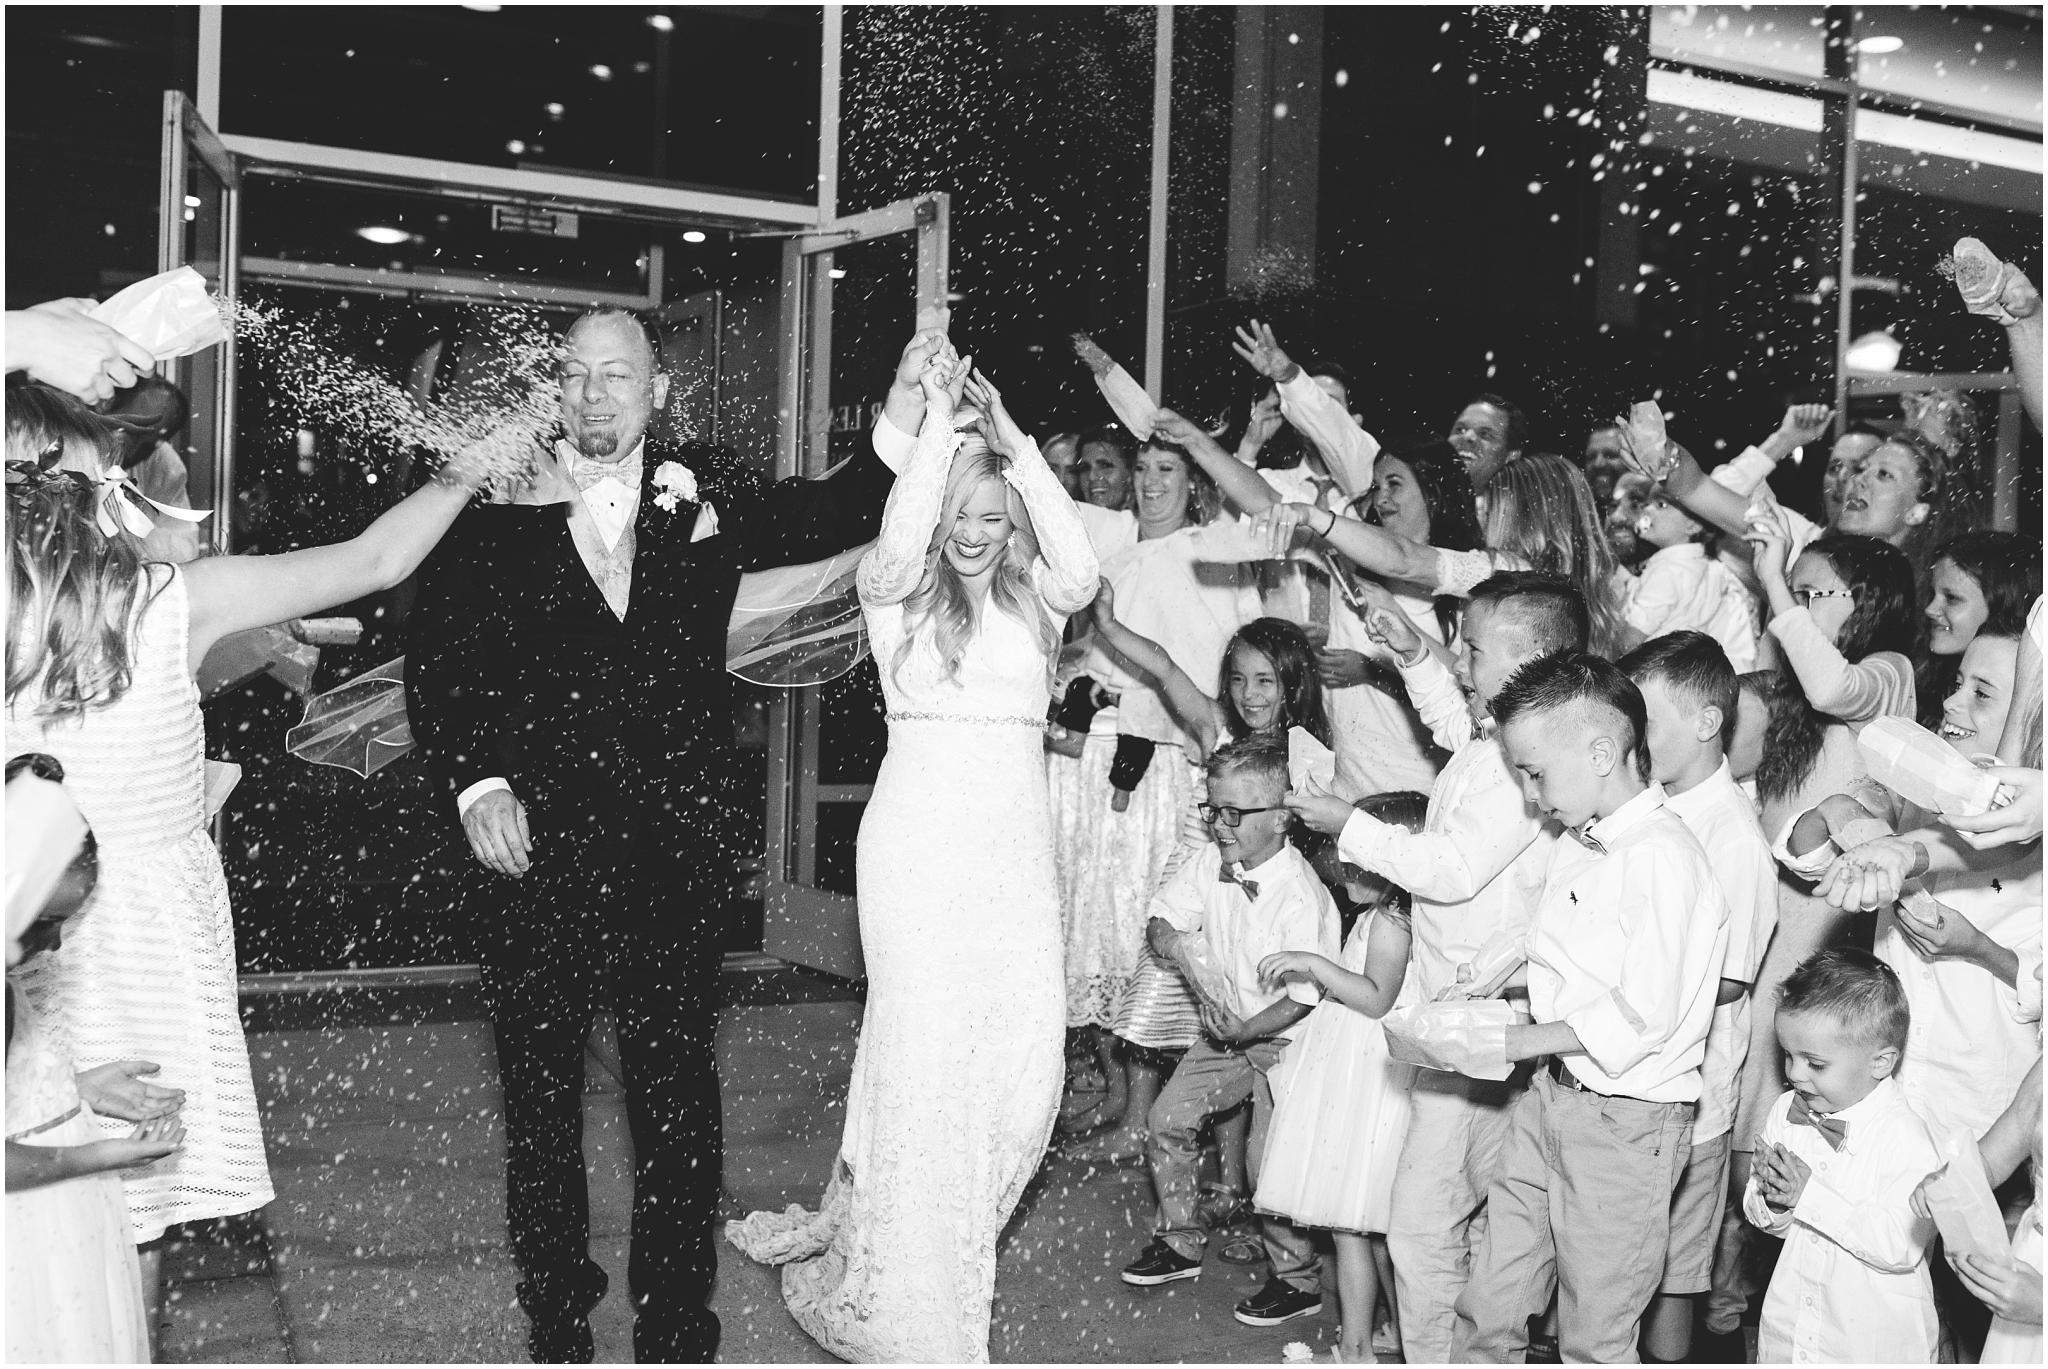 CherylandTyler-654_Lizzie-B-Imagery-Utah-Wedding-Photographer-Salt-Lake-City-Temple-Wells-Fargo-Building-Reception.jpg